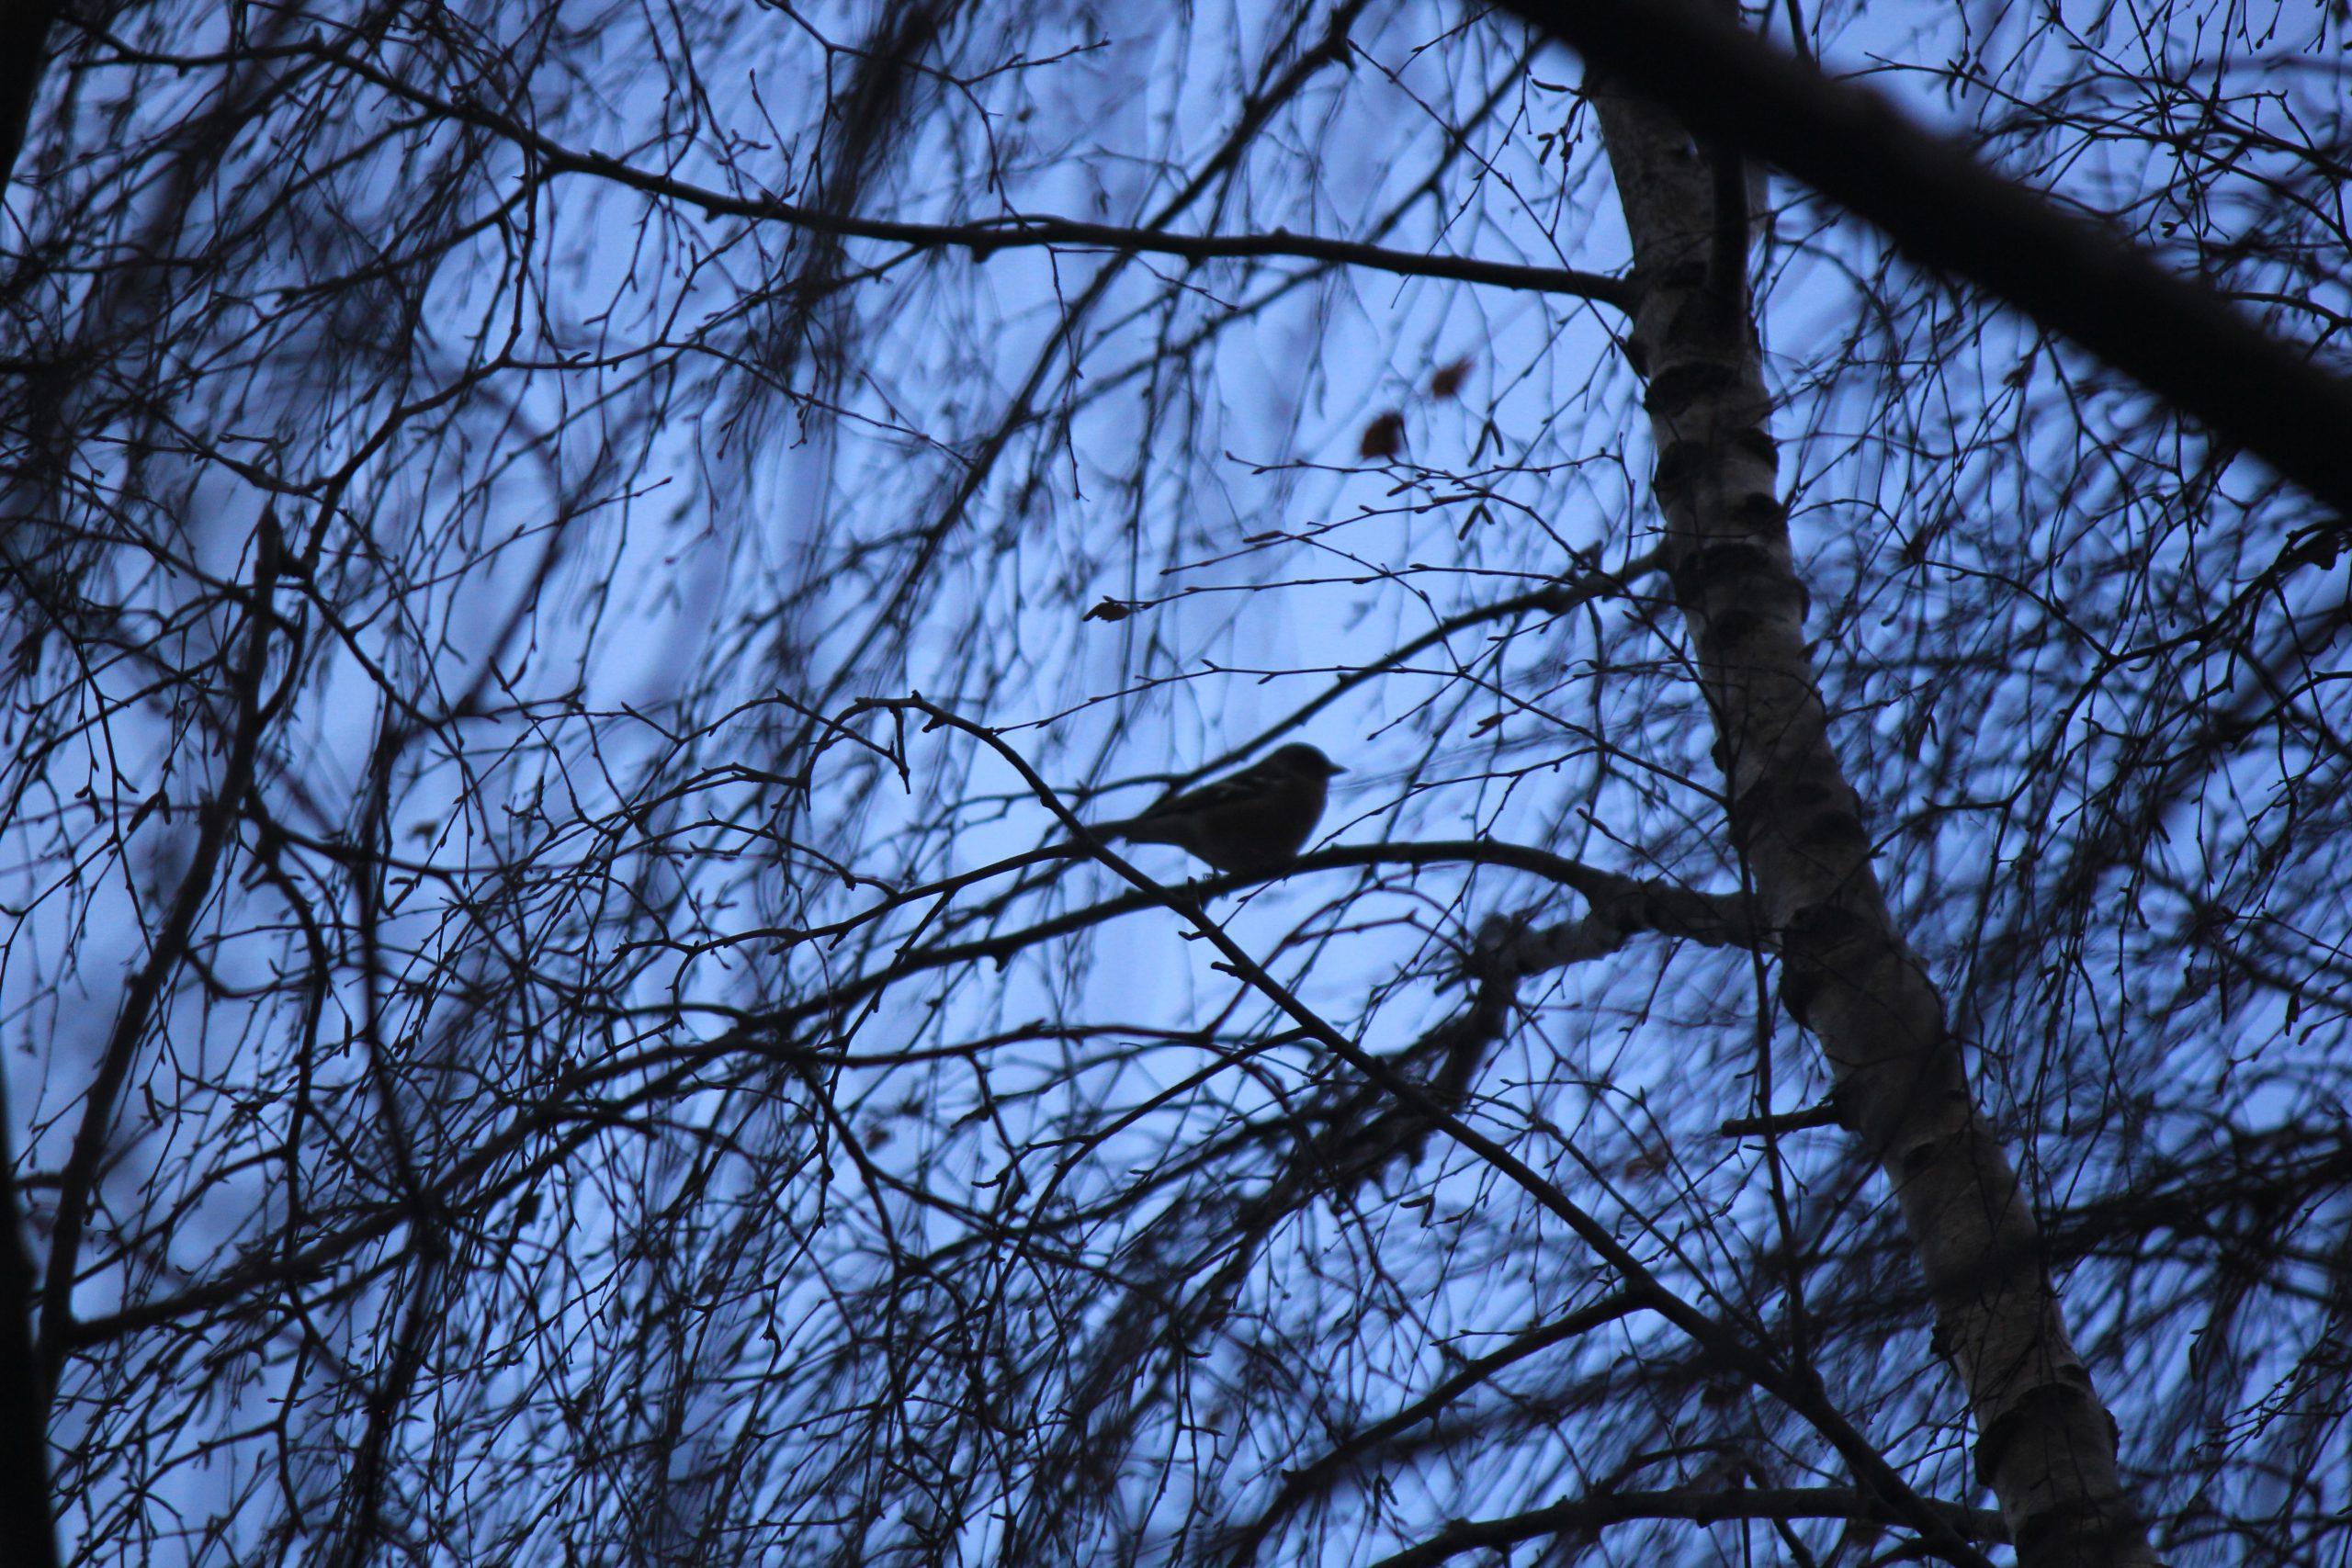 Lone Sparrow at Dusk